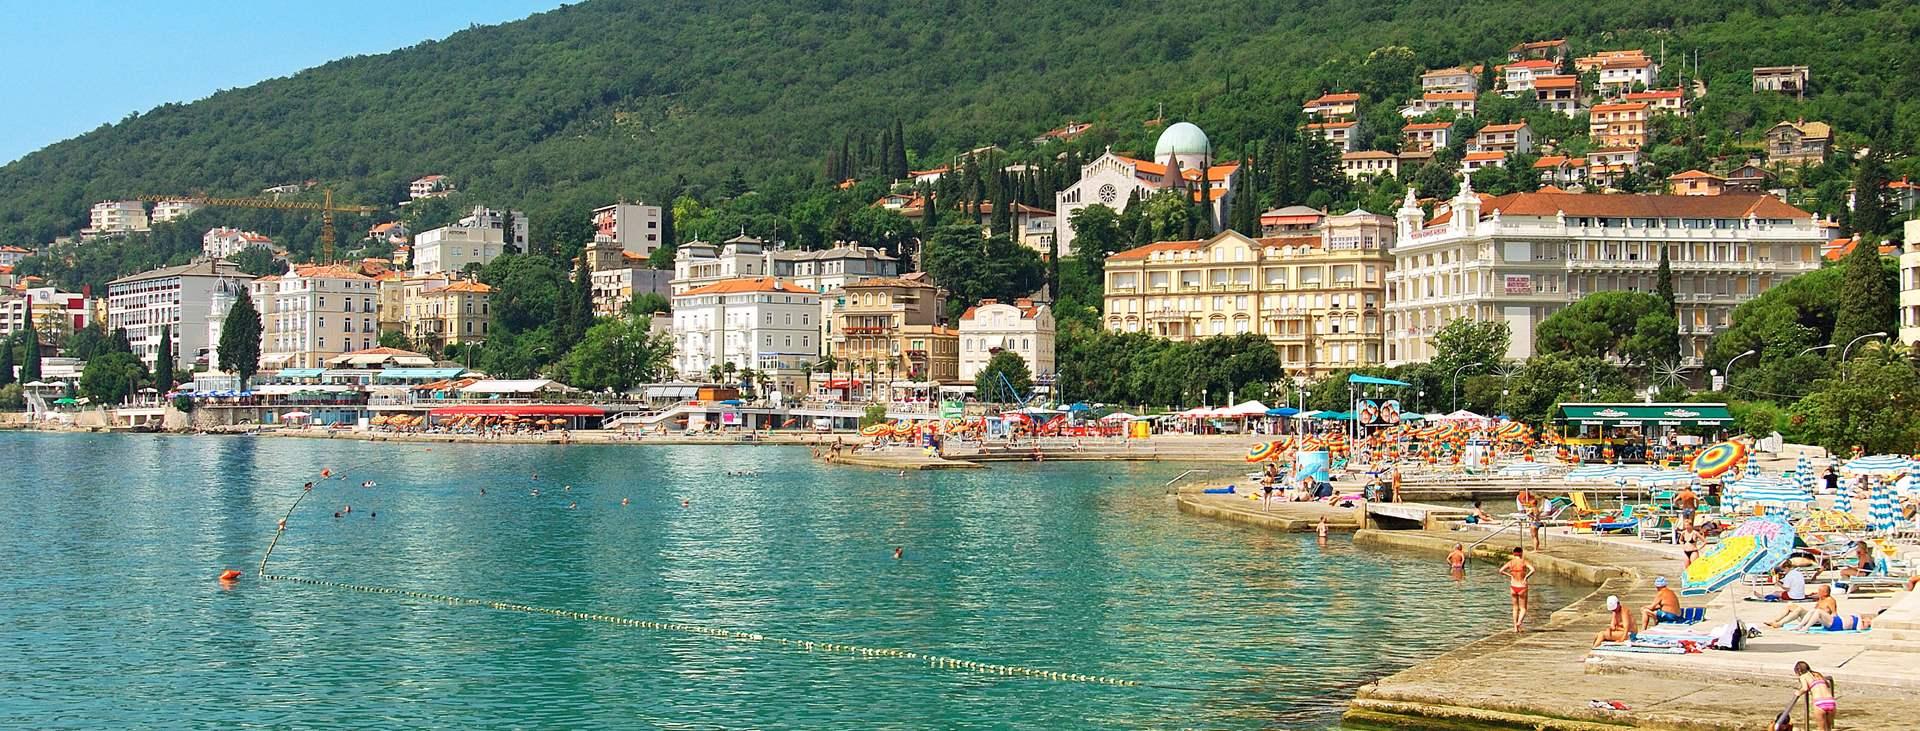 Matkoja Istriaan, Kroatiaan